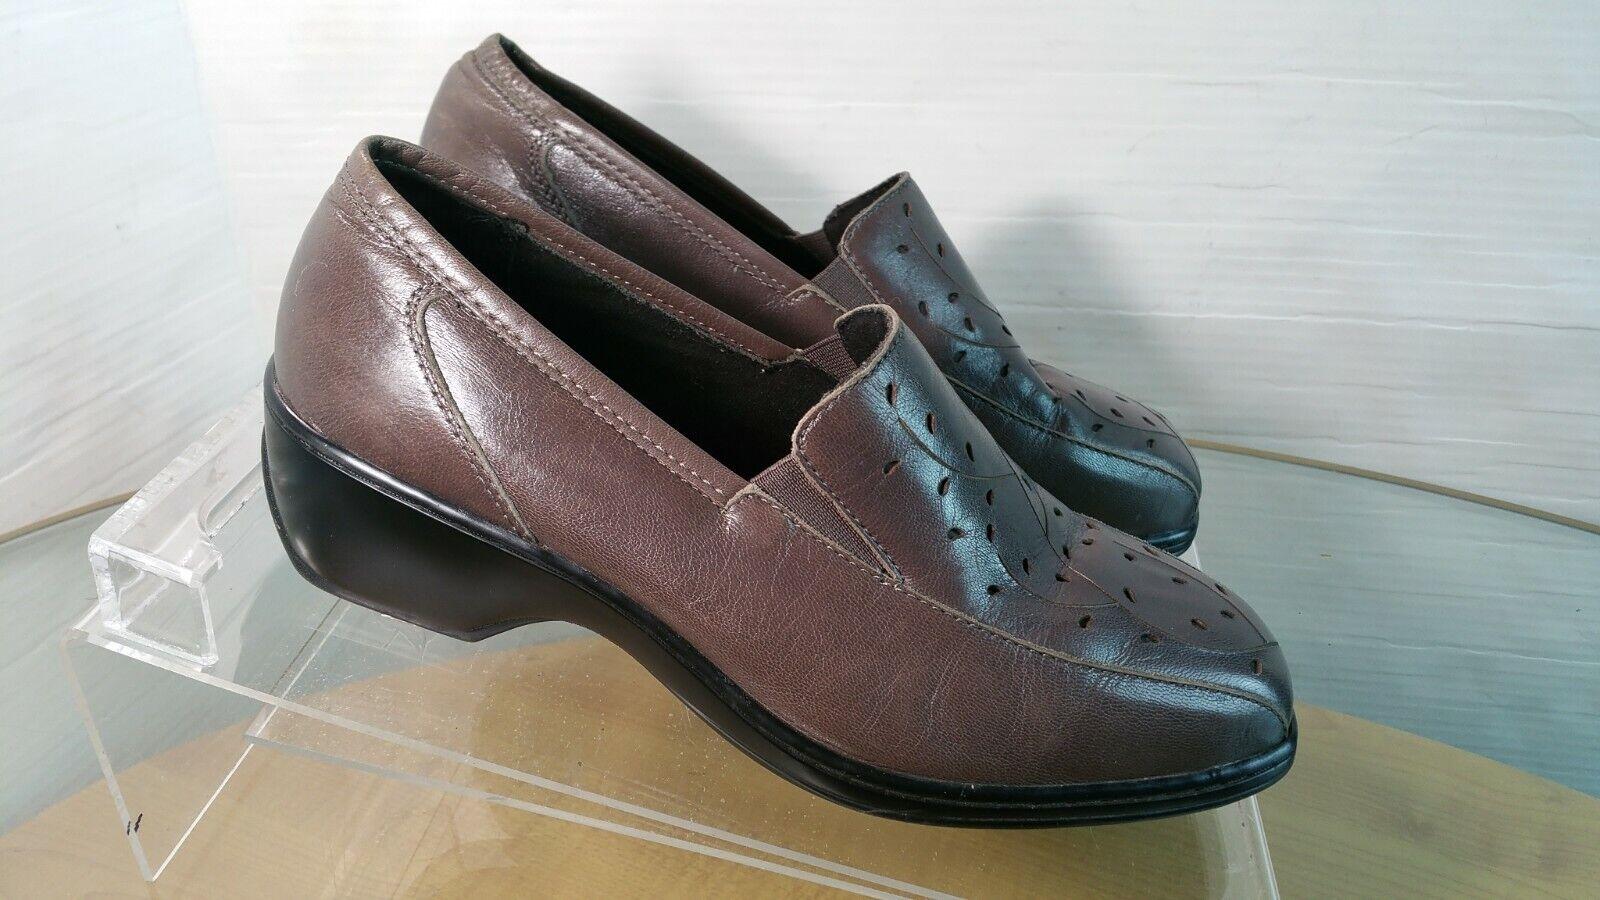 ARAVON Kiley Women's Slip On Loafers shoes Leather  Size 8 D